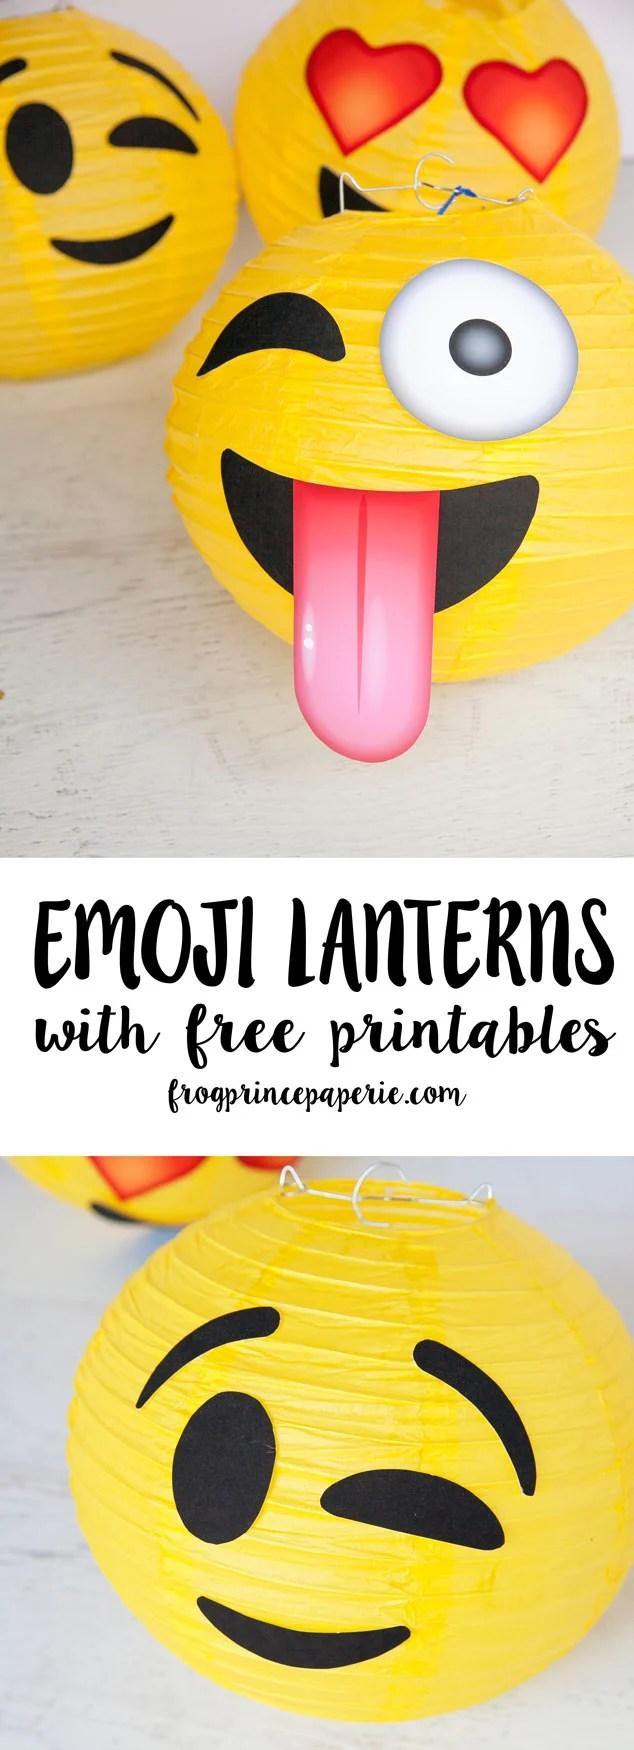 Emoji-lantern-with-free-printables